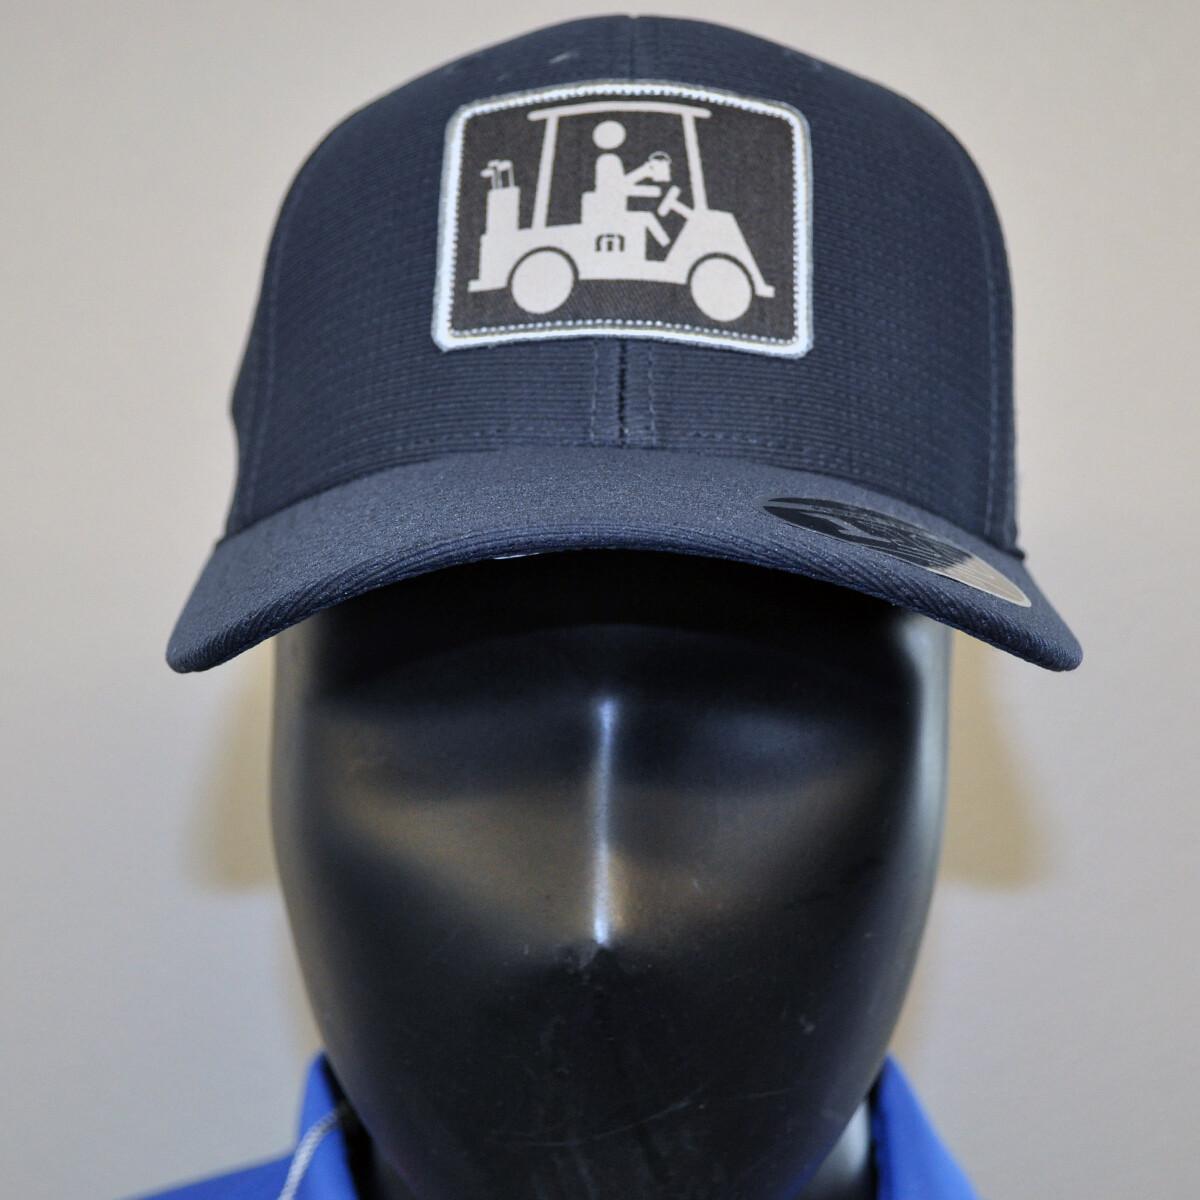 "Men's Golf Hat - Travis Mathew ""Mapes"" - OSFA Navy/Gray"